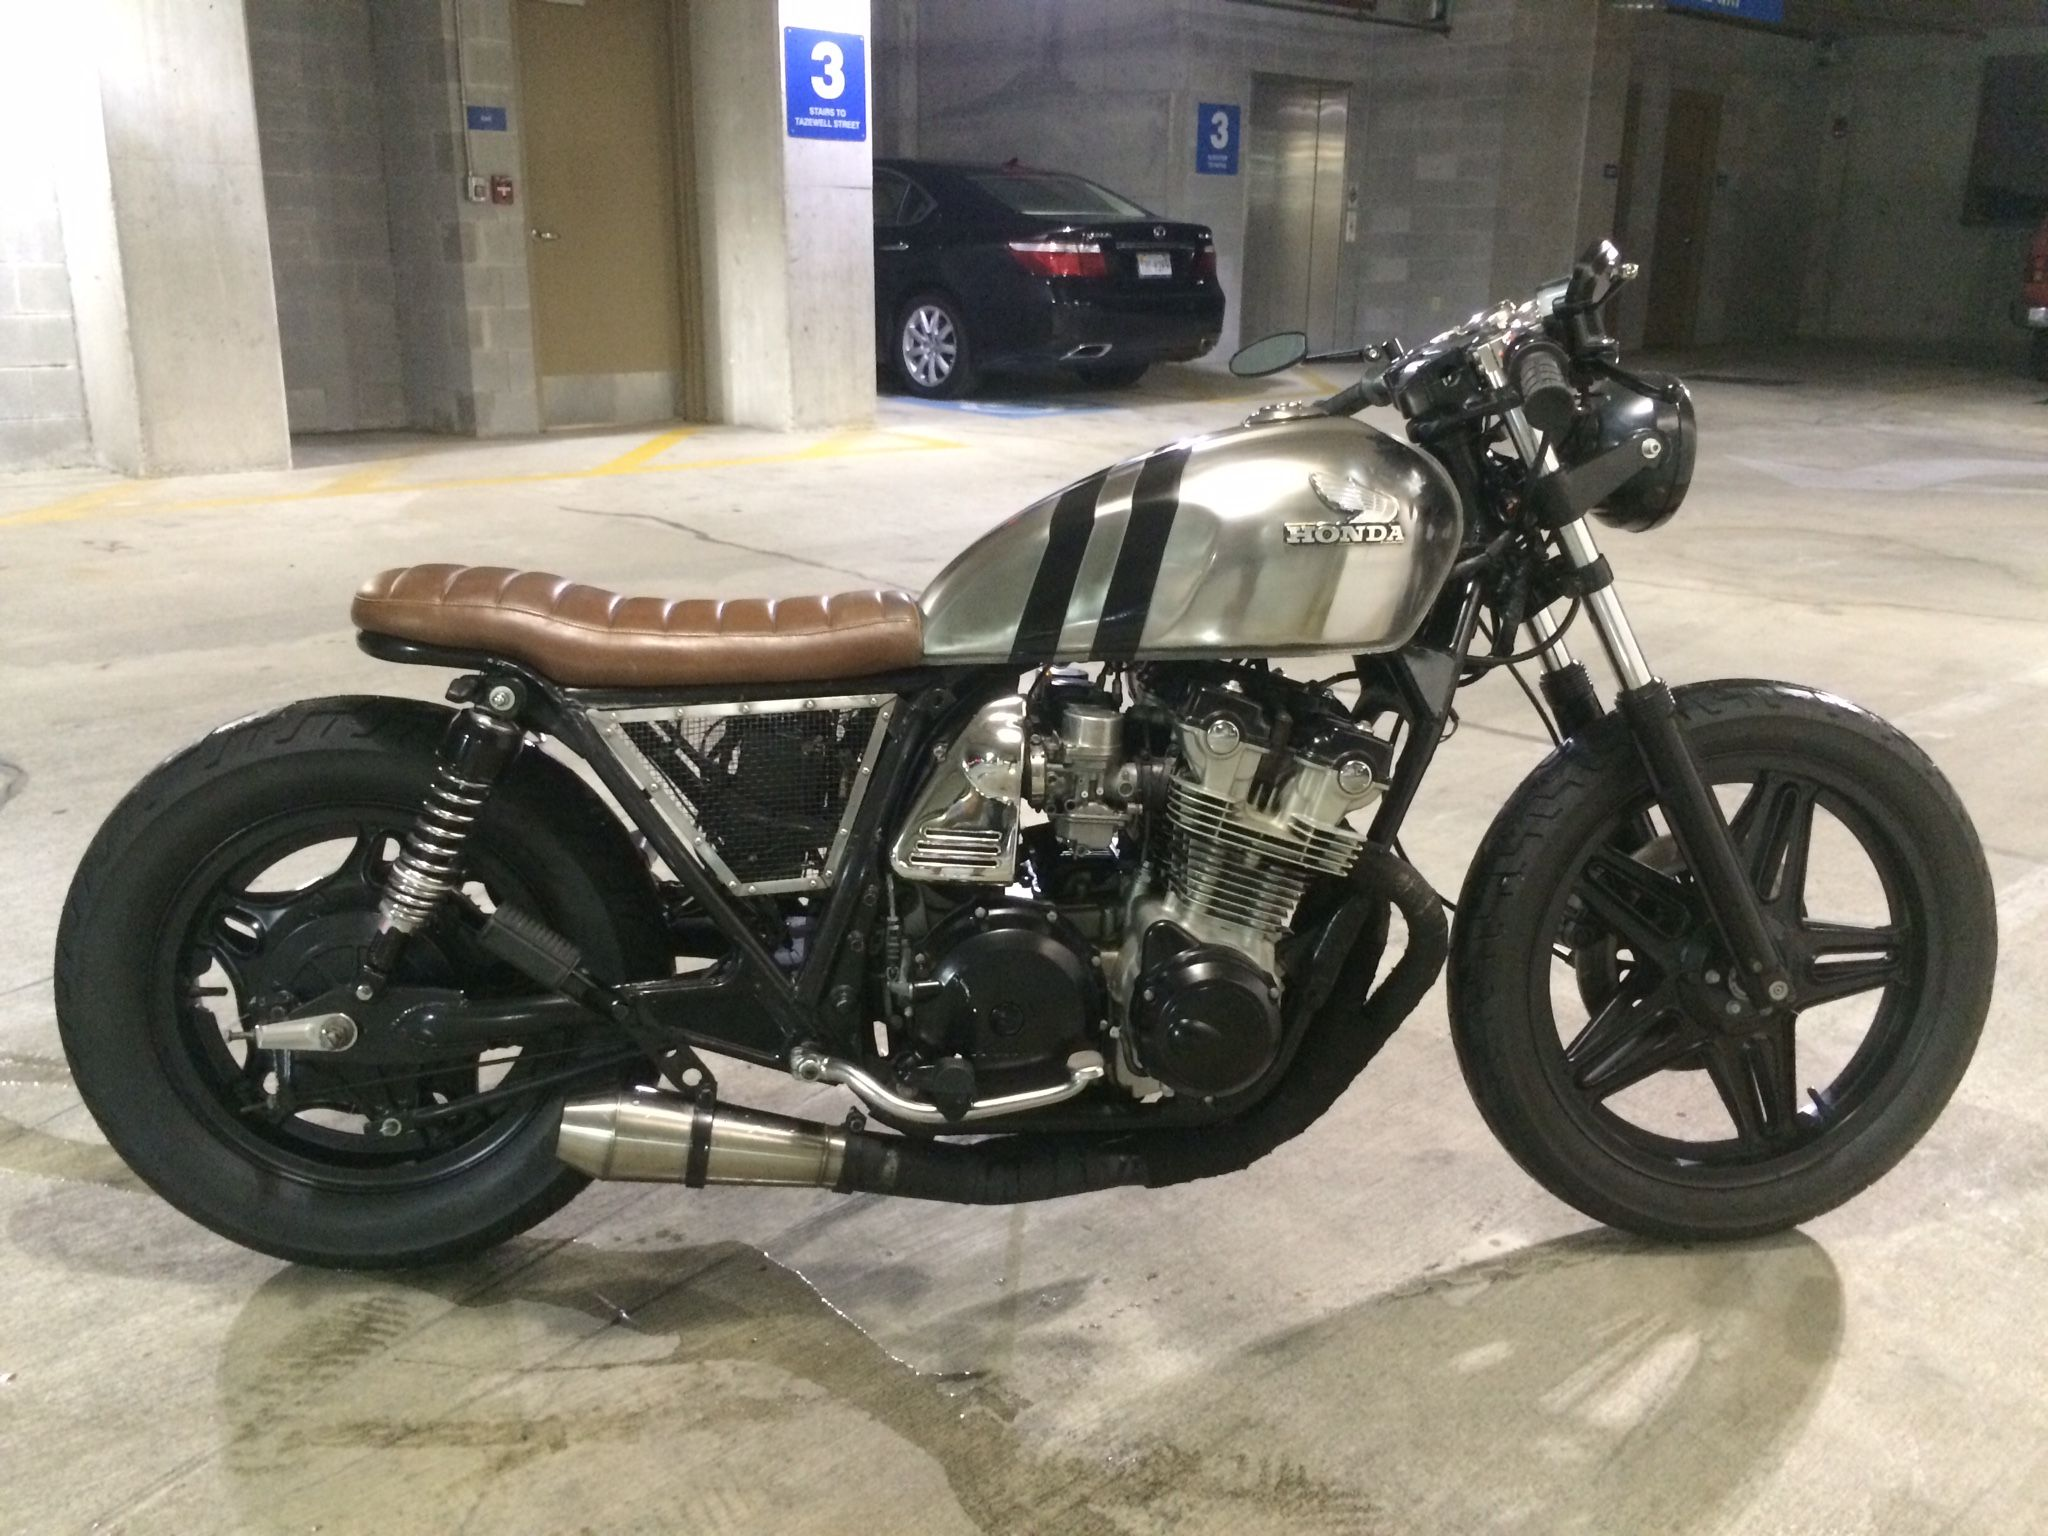 My Custom 1980 Cb750c Cafe Racer Honda Cb750 Cafe Racer Cafe Racer Motorcycle [ 1536 x 2048 Pixel ]